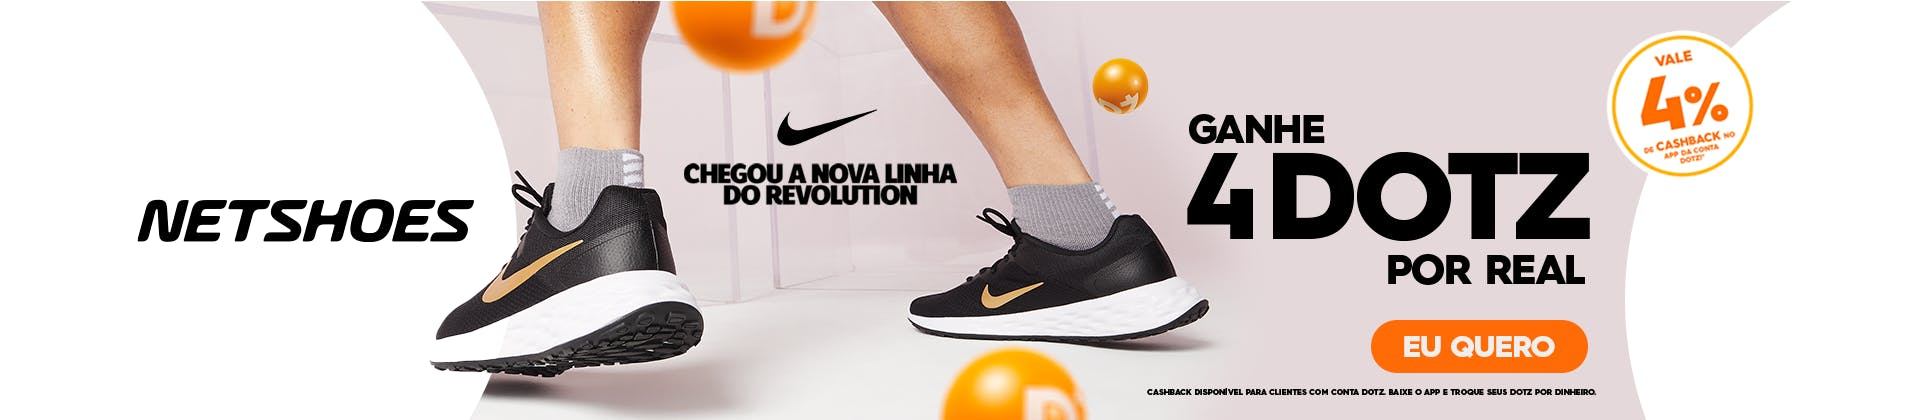 Netshoes Revolution